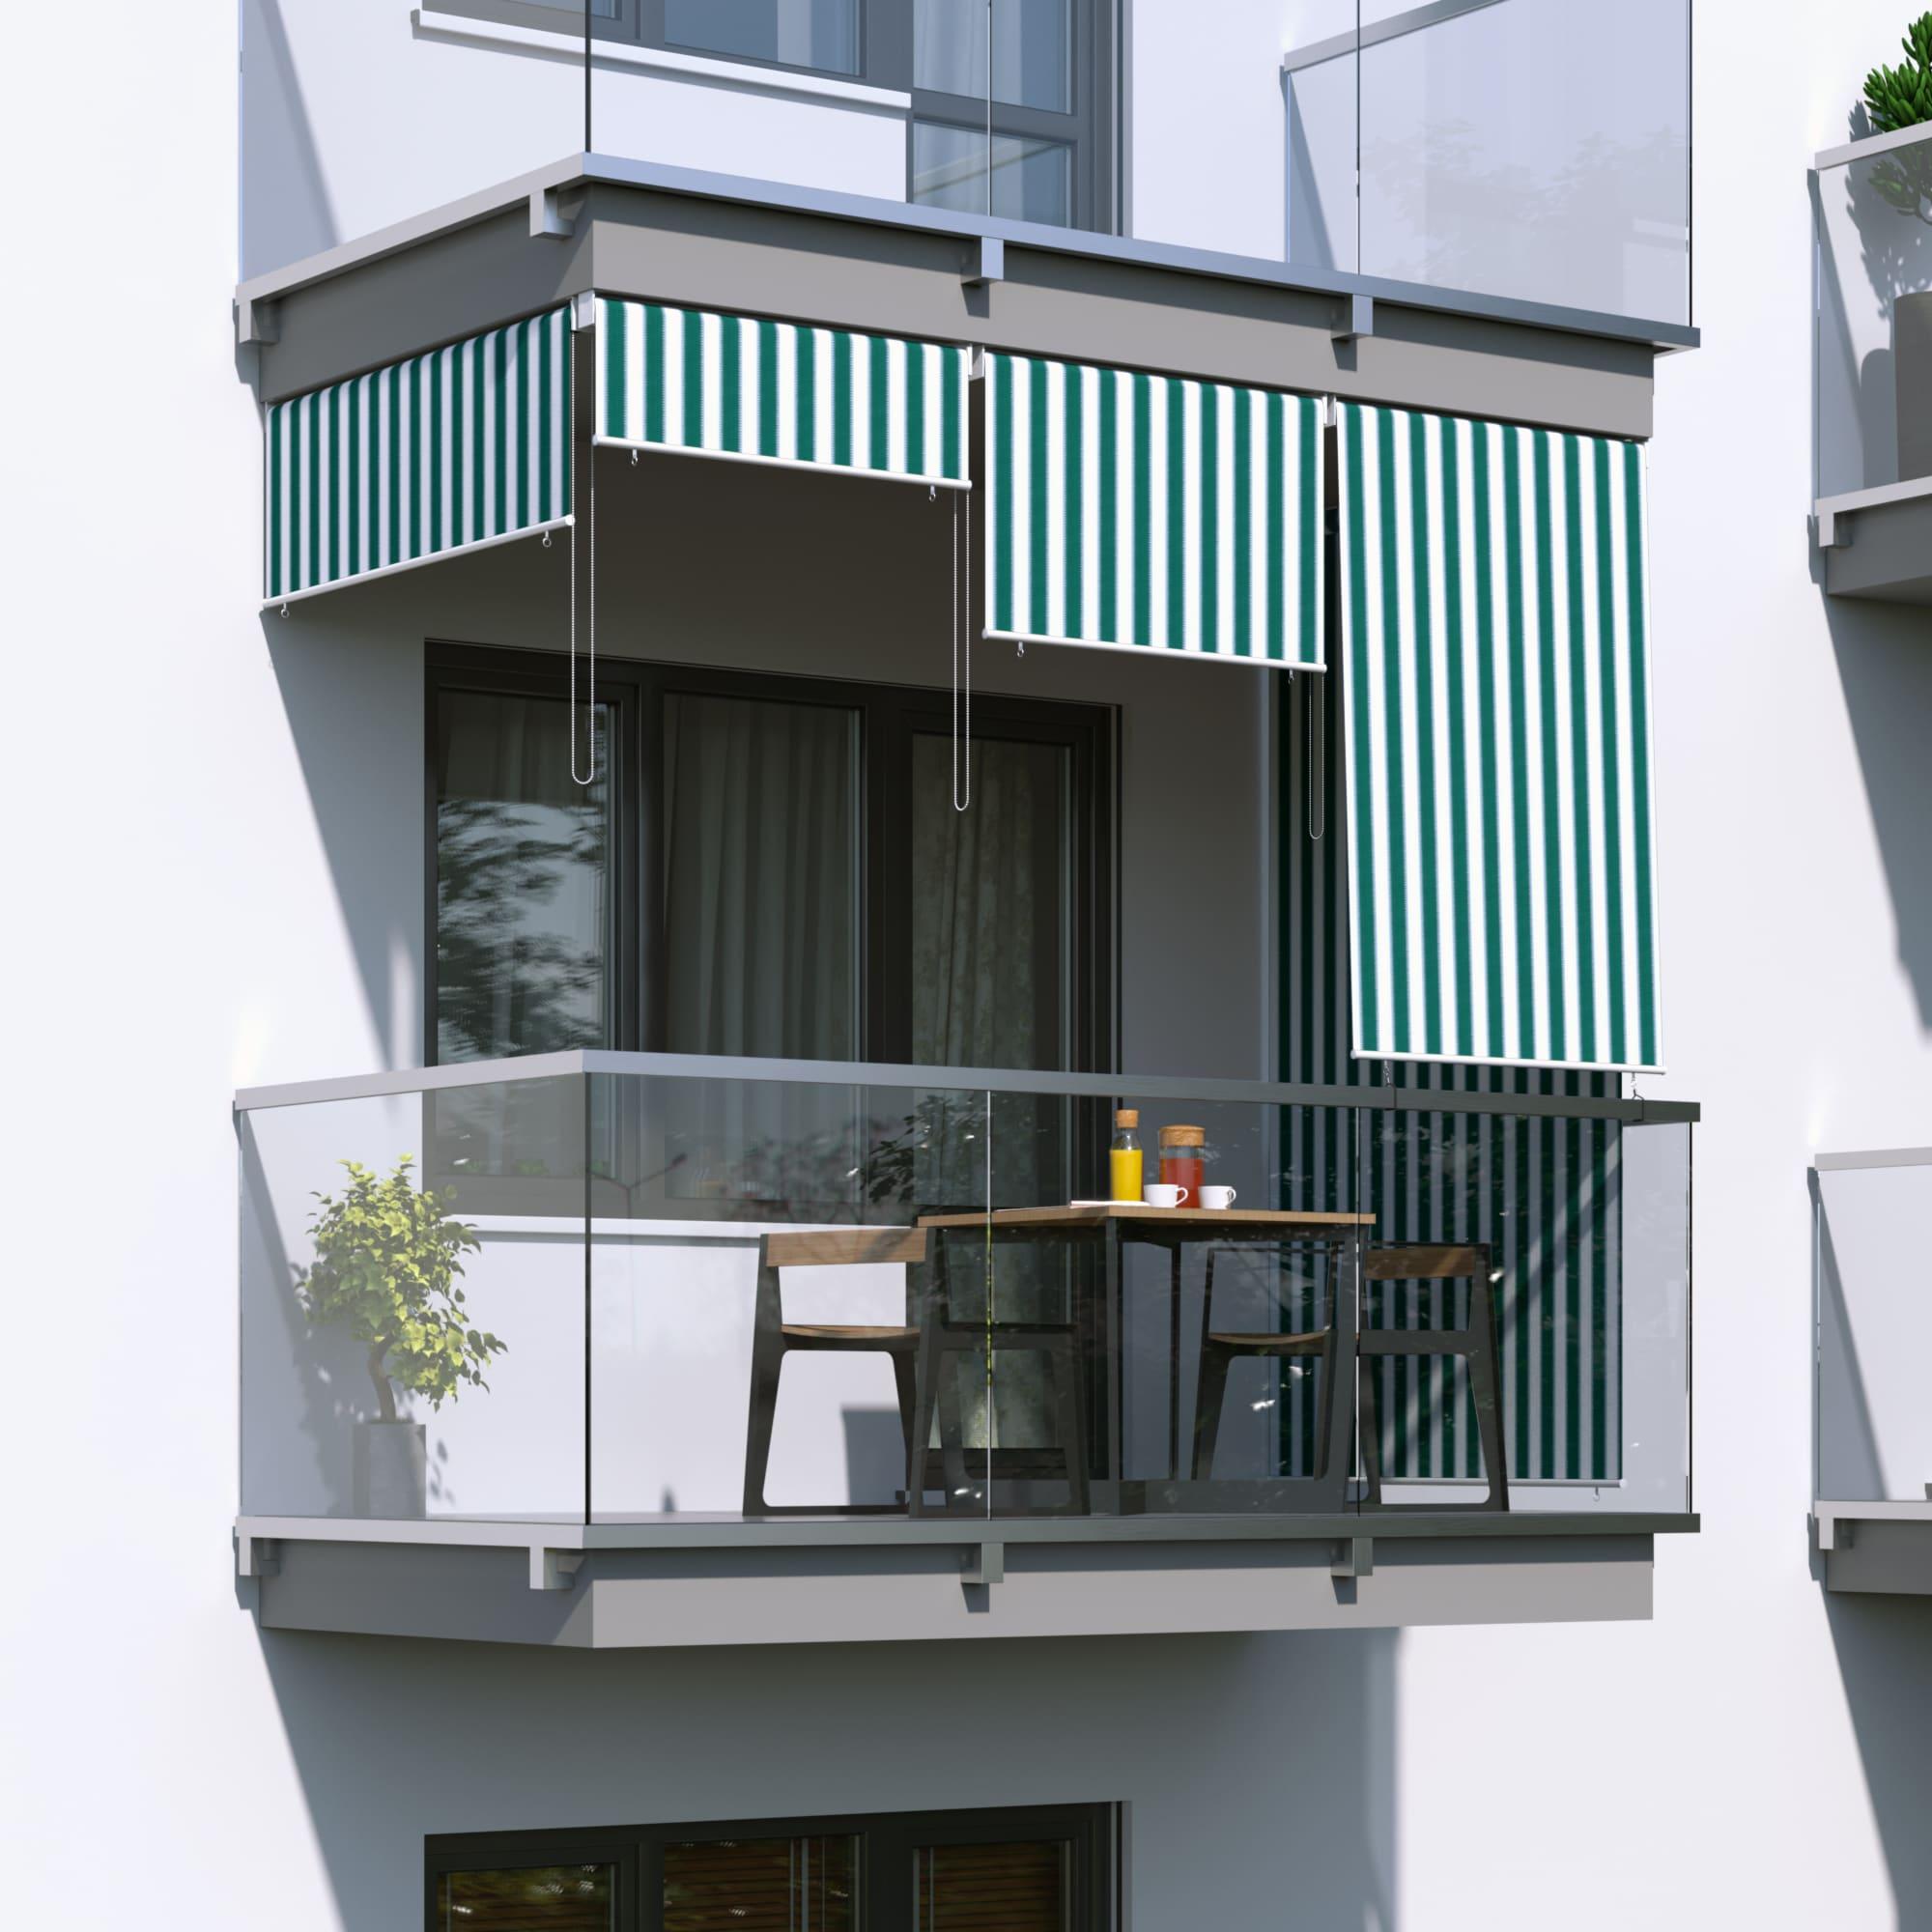 JAROLIFT-Senkrechtmarkise-Sichtschutz-Aussenrollo-Sonnenschutz-Aussen-Rollo-Balkon Indexbild 28